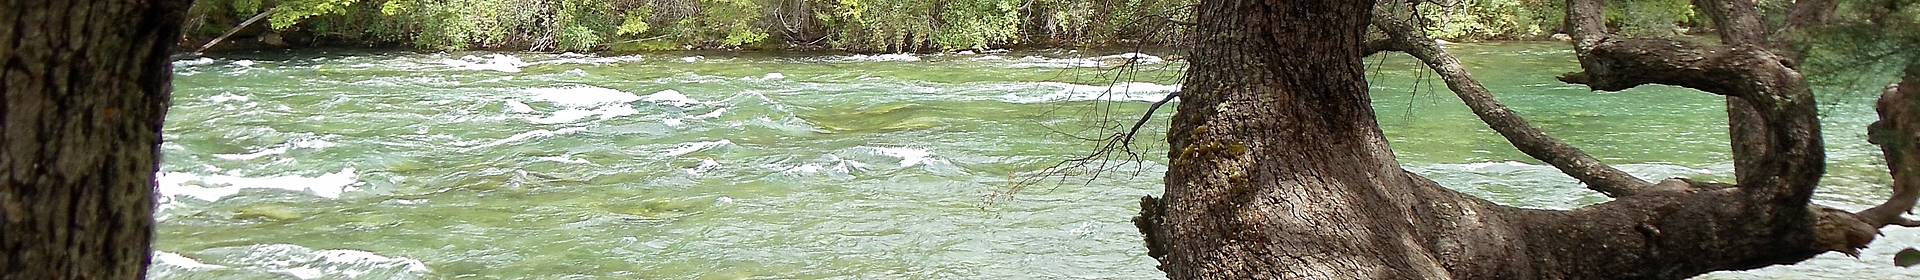 Río Manso